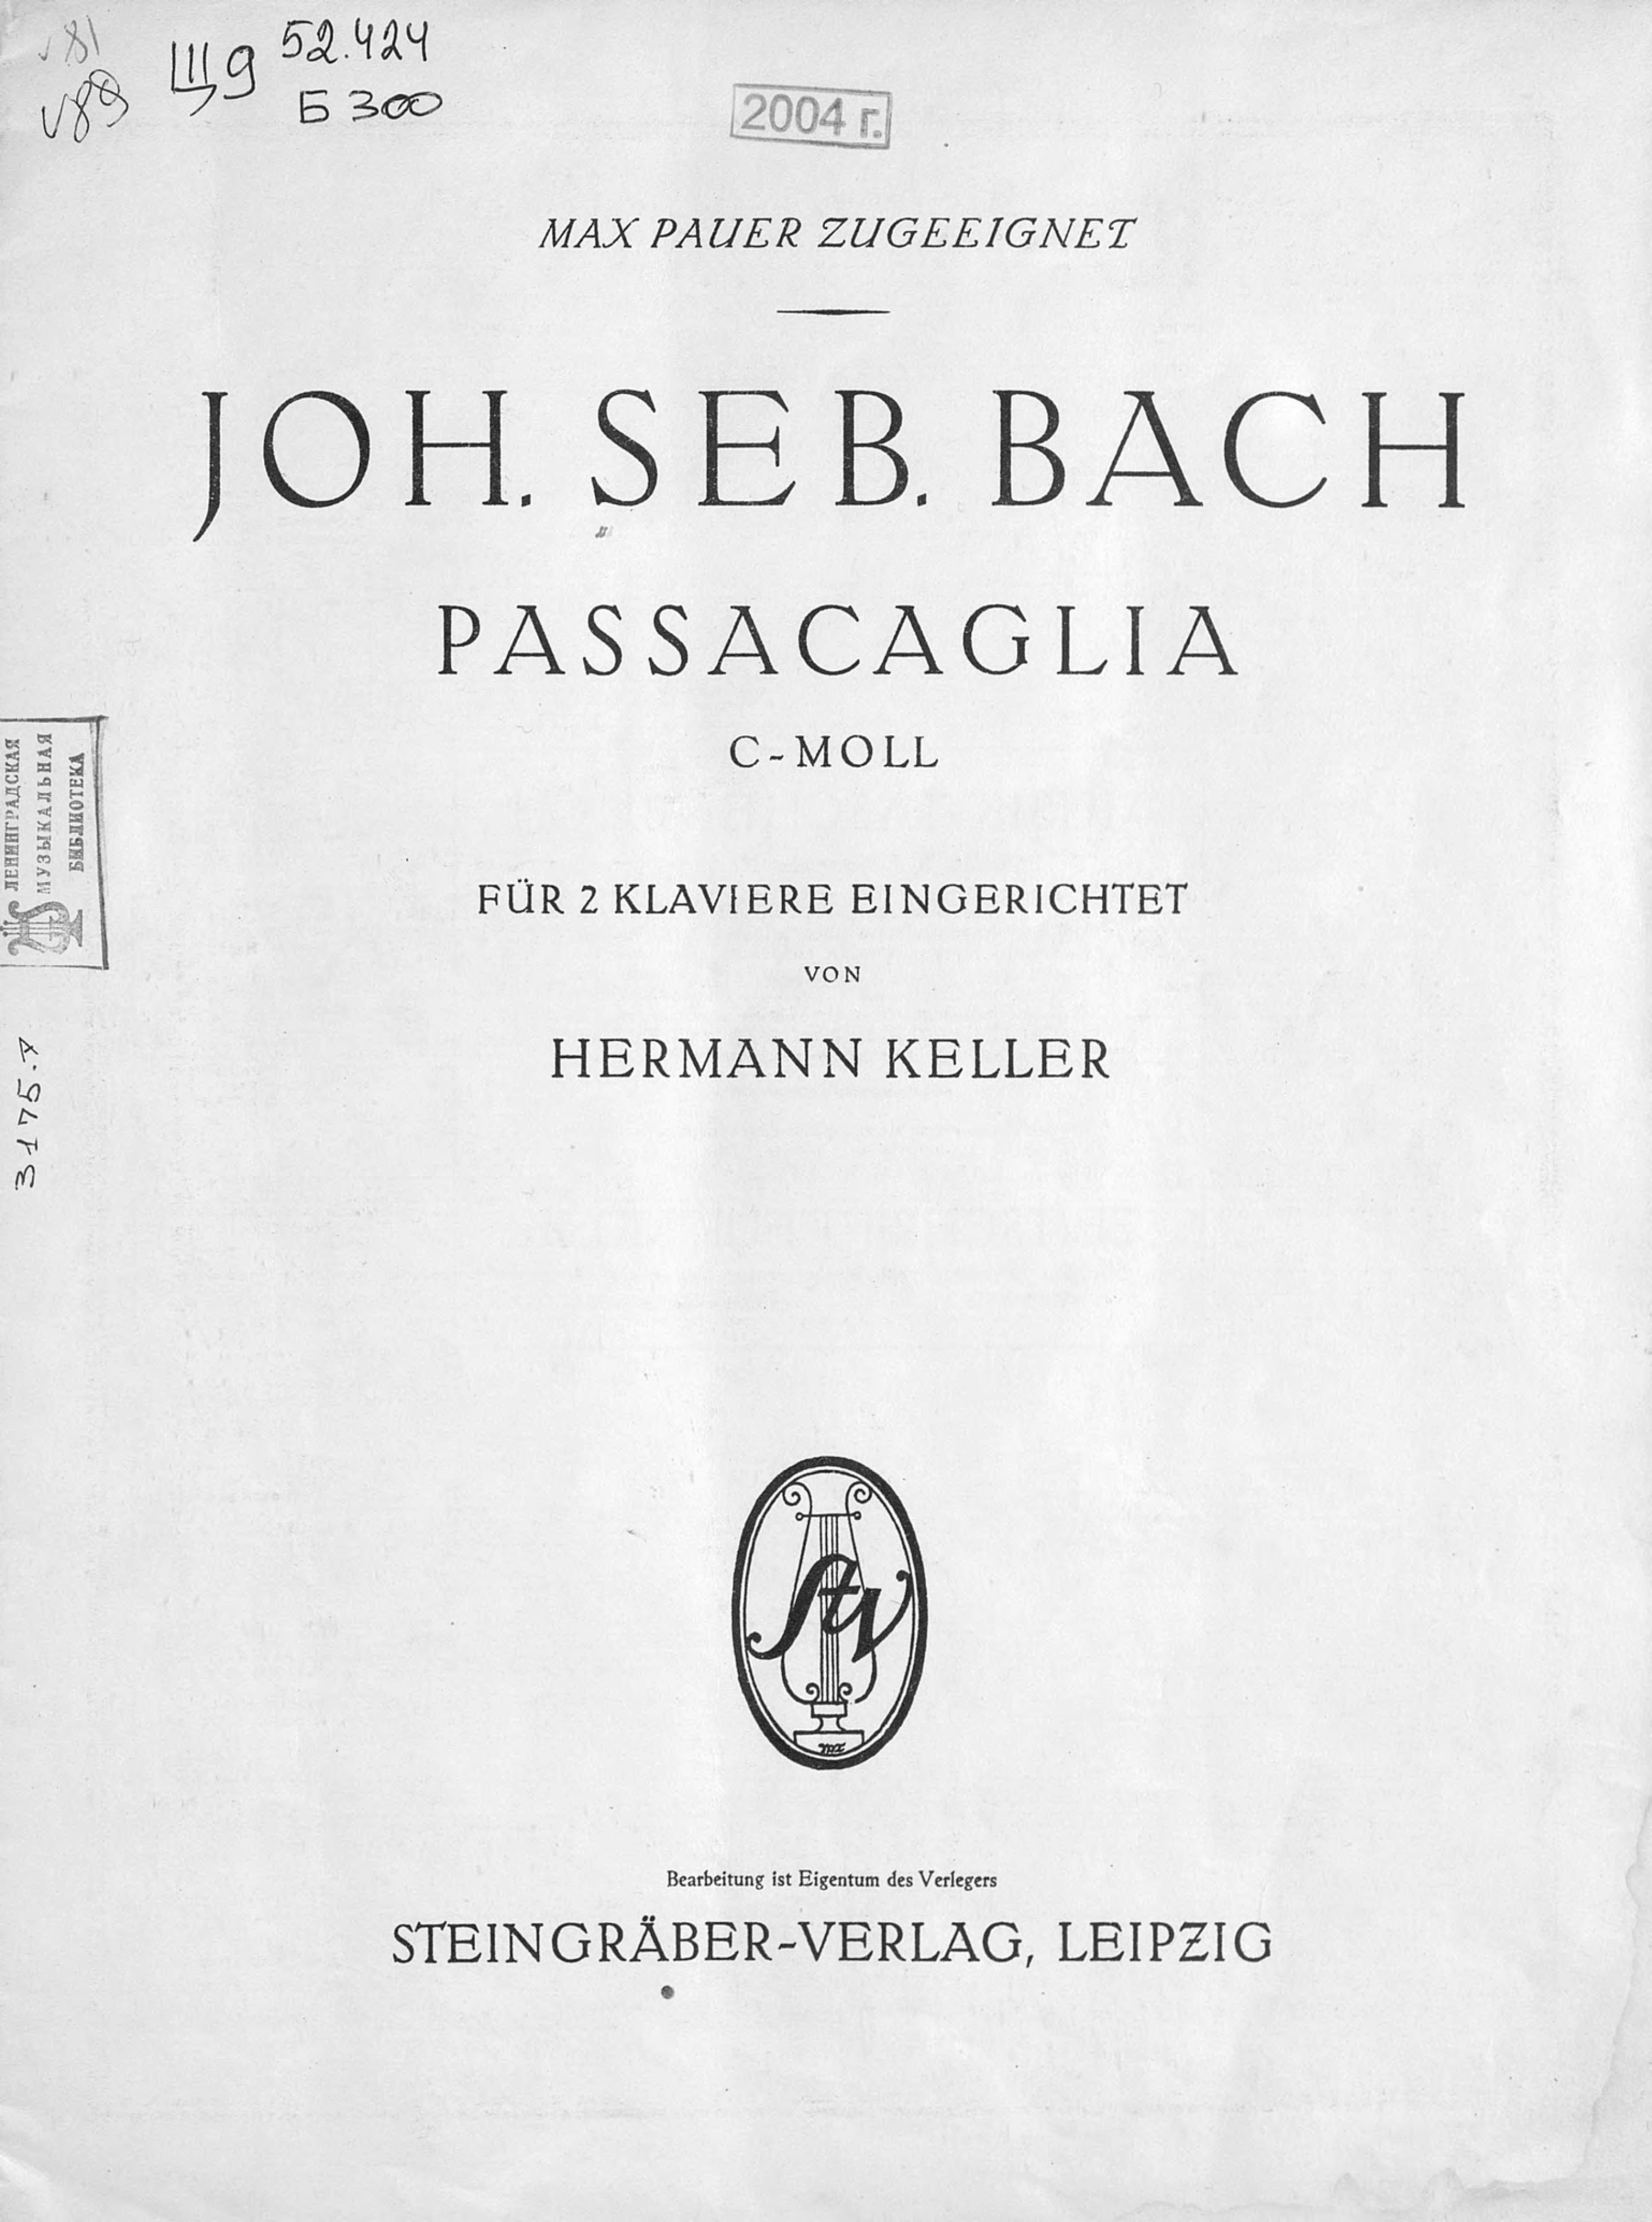 цена Иоганн Себастьян Бах Passacaglia c-moll онлайн в 2017 году